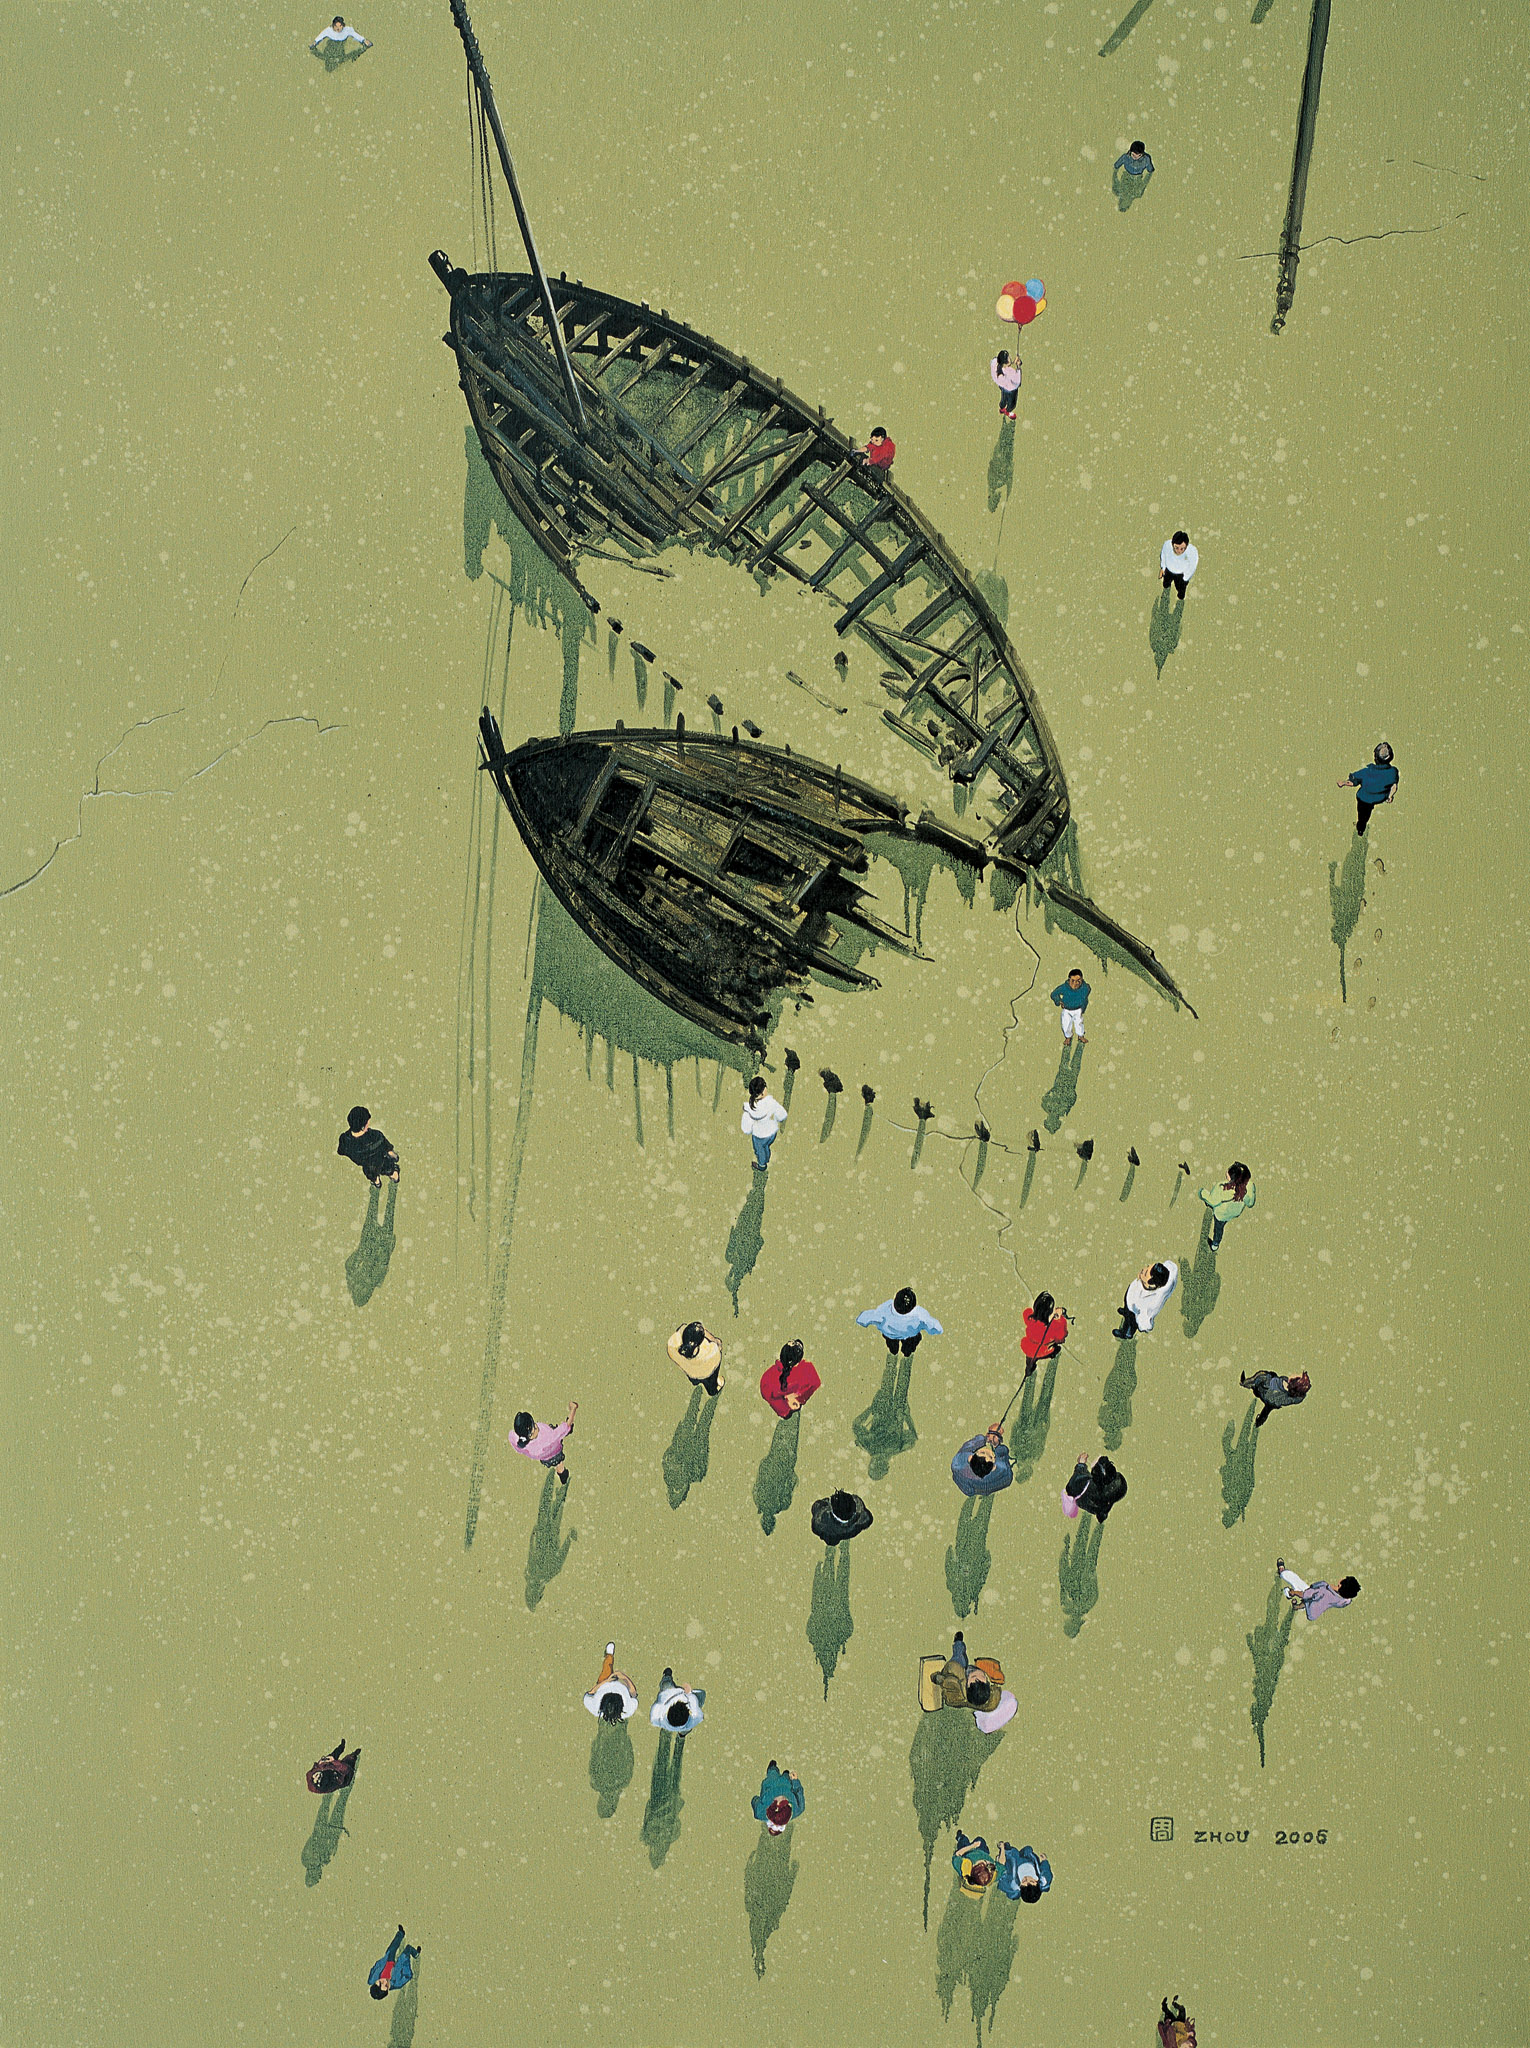 Zhou Jinhua 周金华, Shipwrecks No.1 沉船 No.1, 2006, Oil on canvas 布面油画, 145 x 110 cm